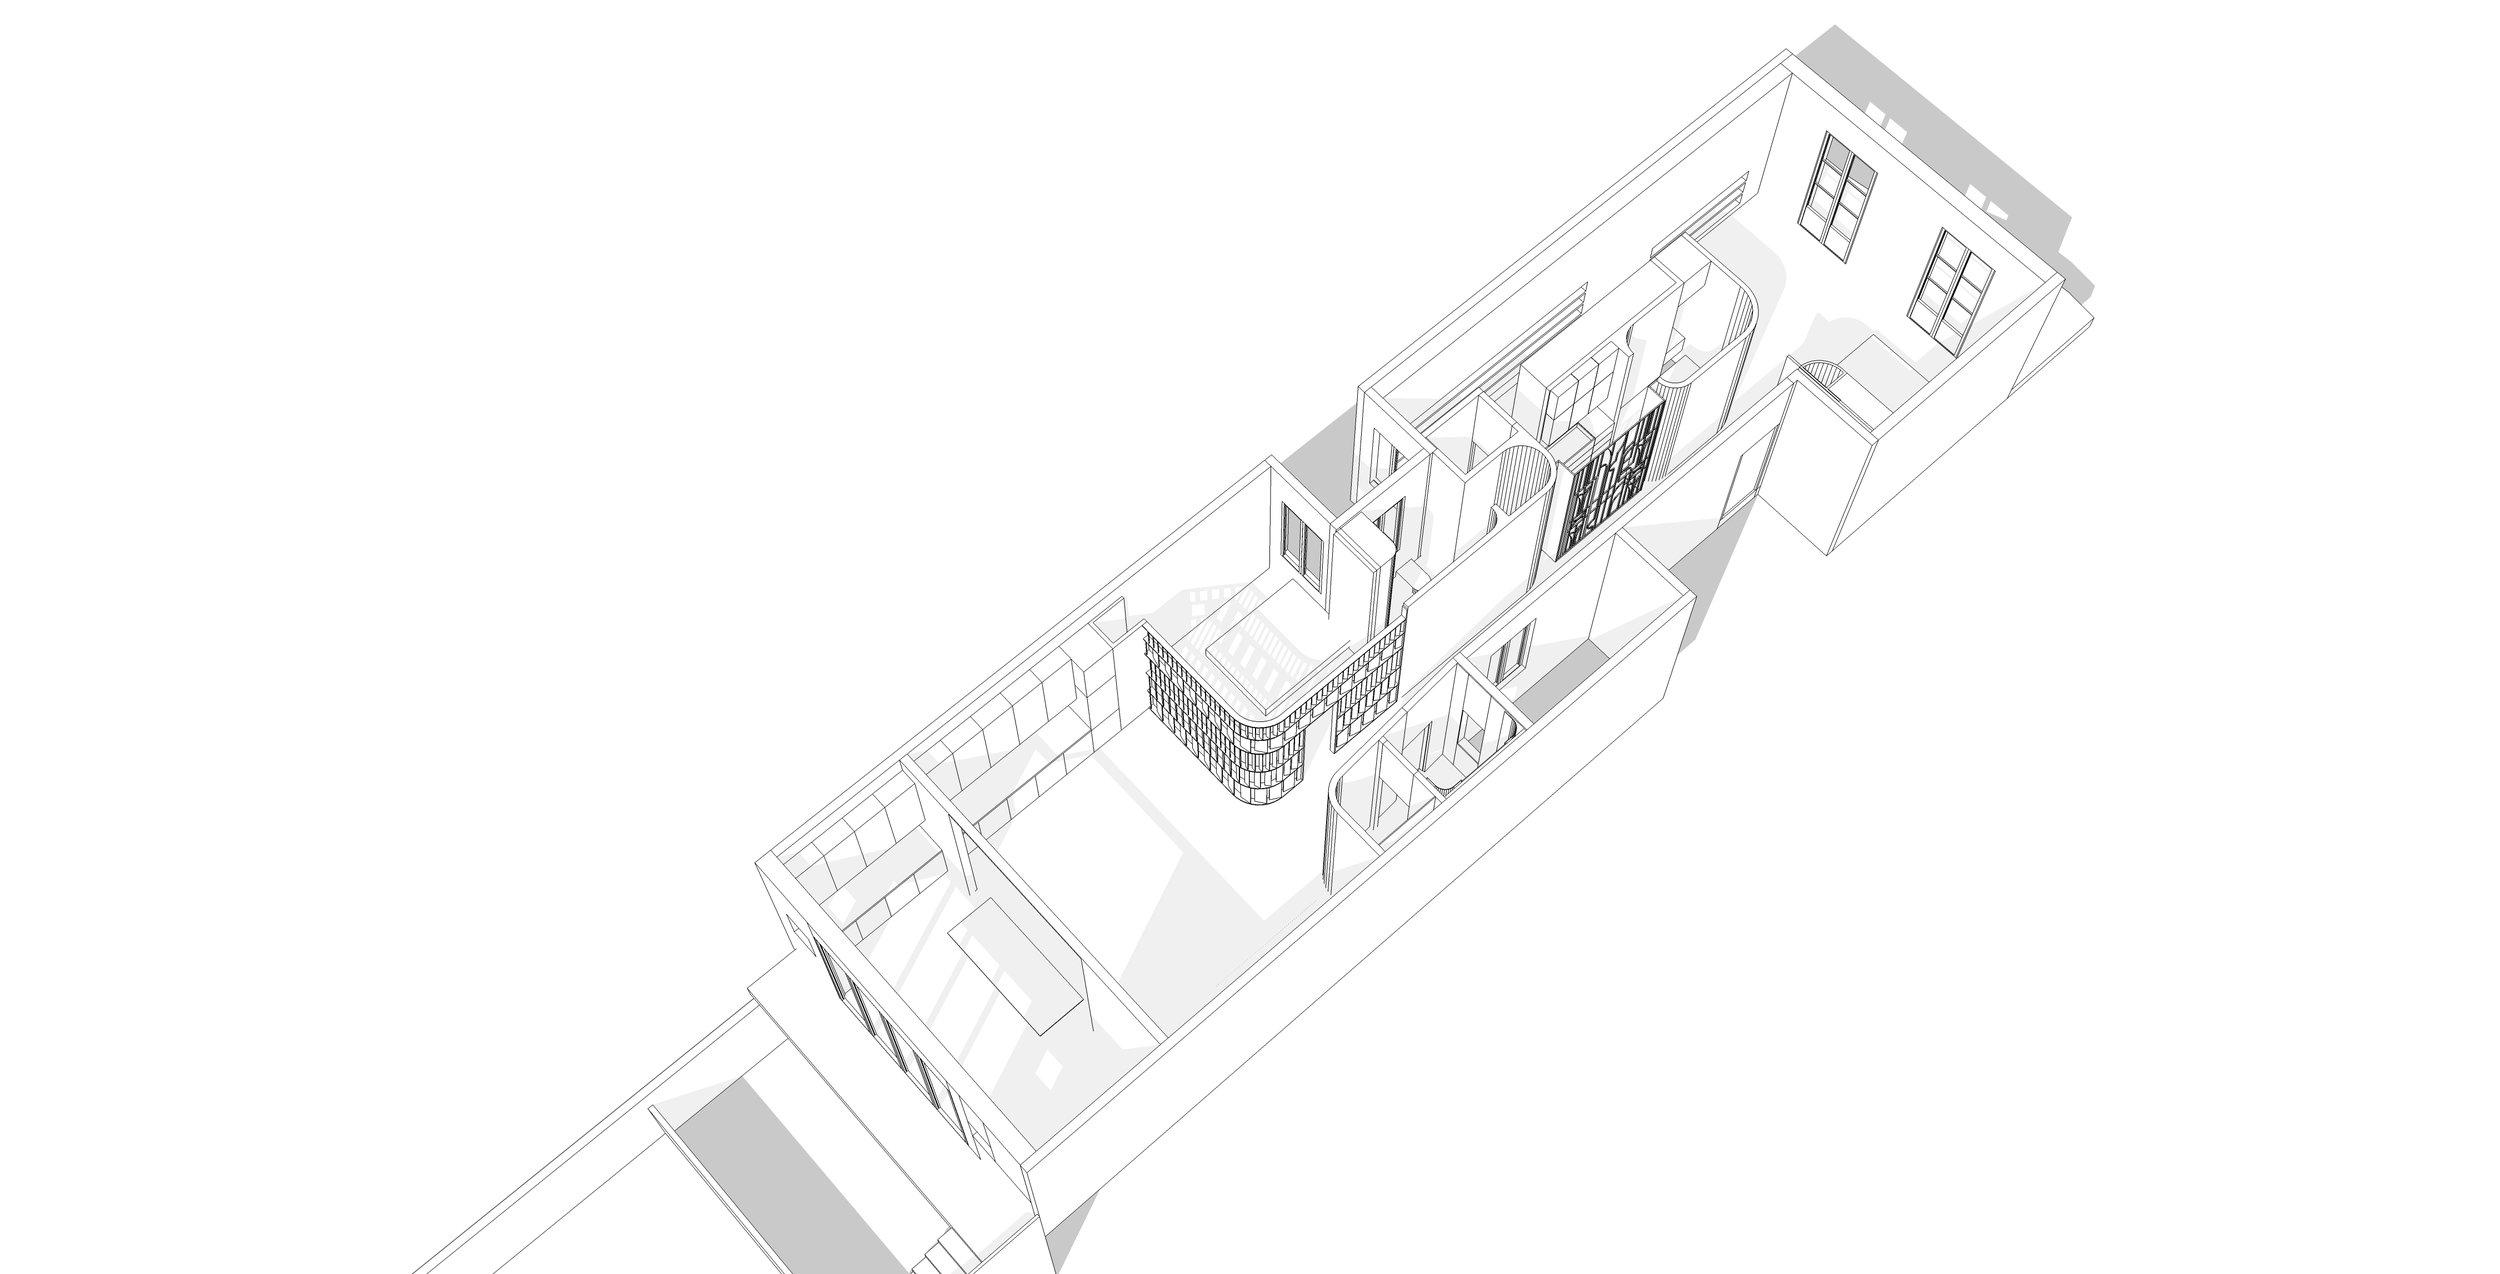 GeorgKayser_architecture_interiordesign_residencial_eixample_architecturaldrawings_1.jpg